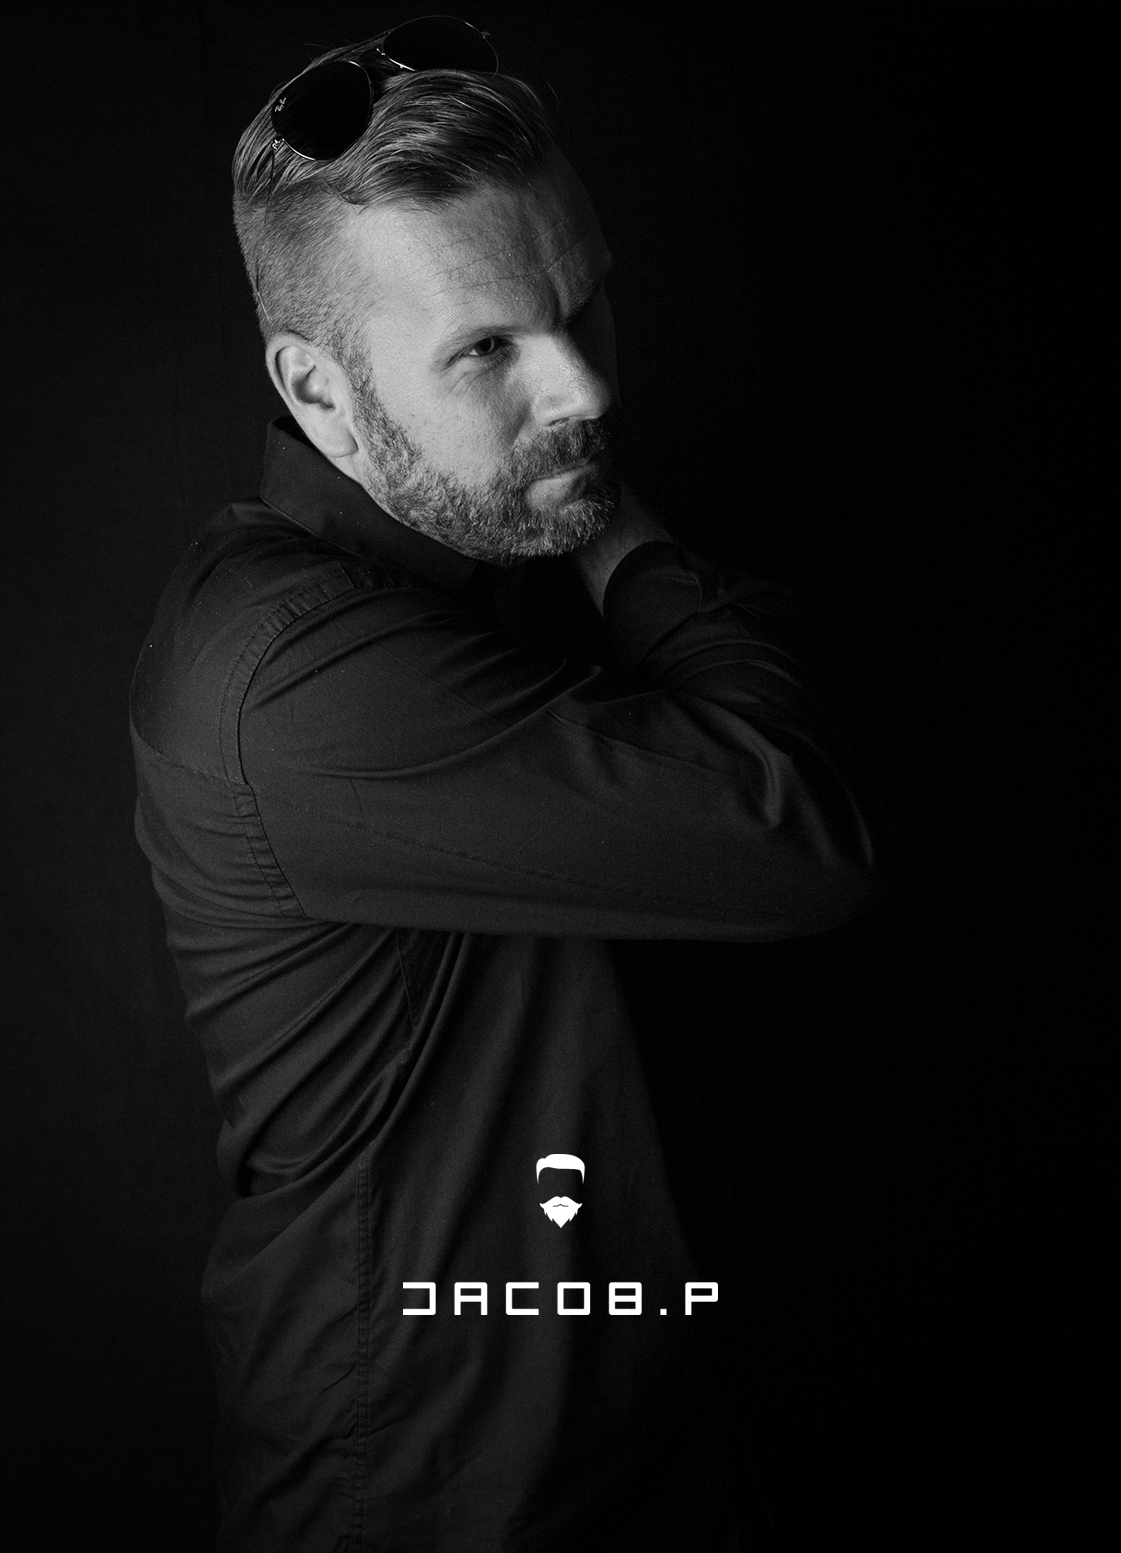 jacob_p